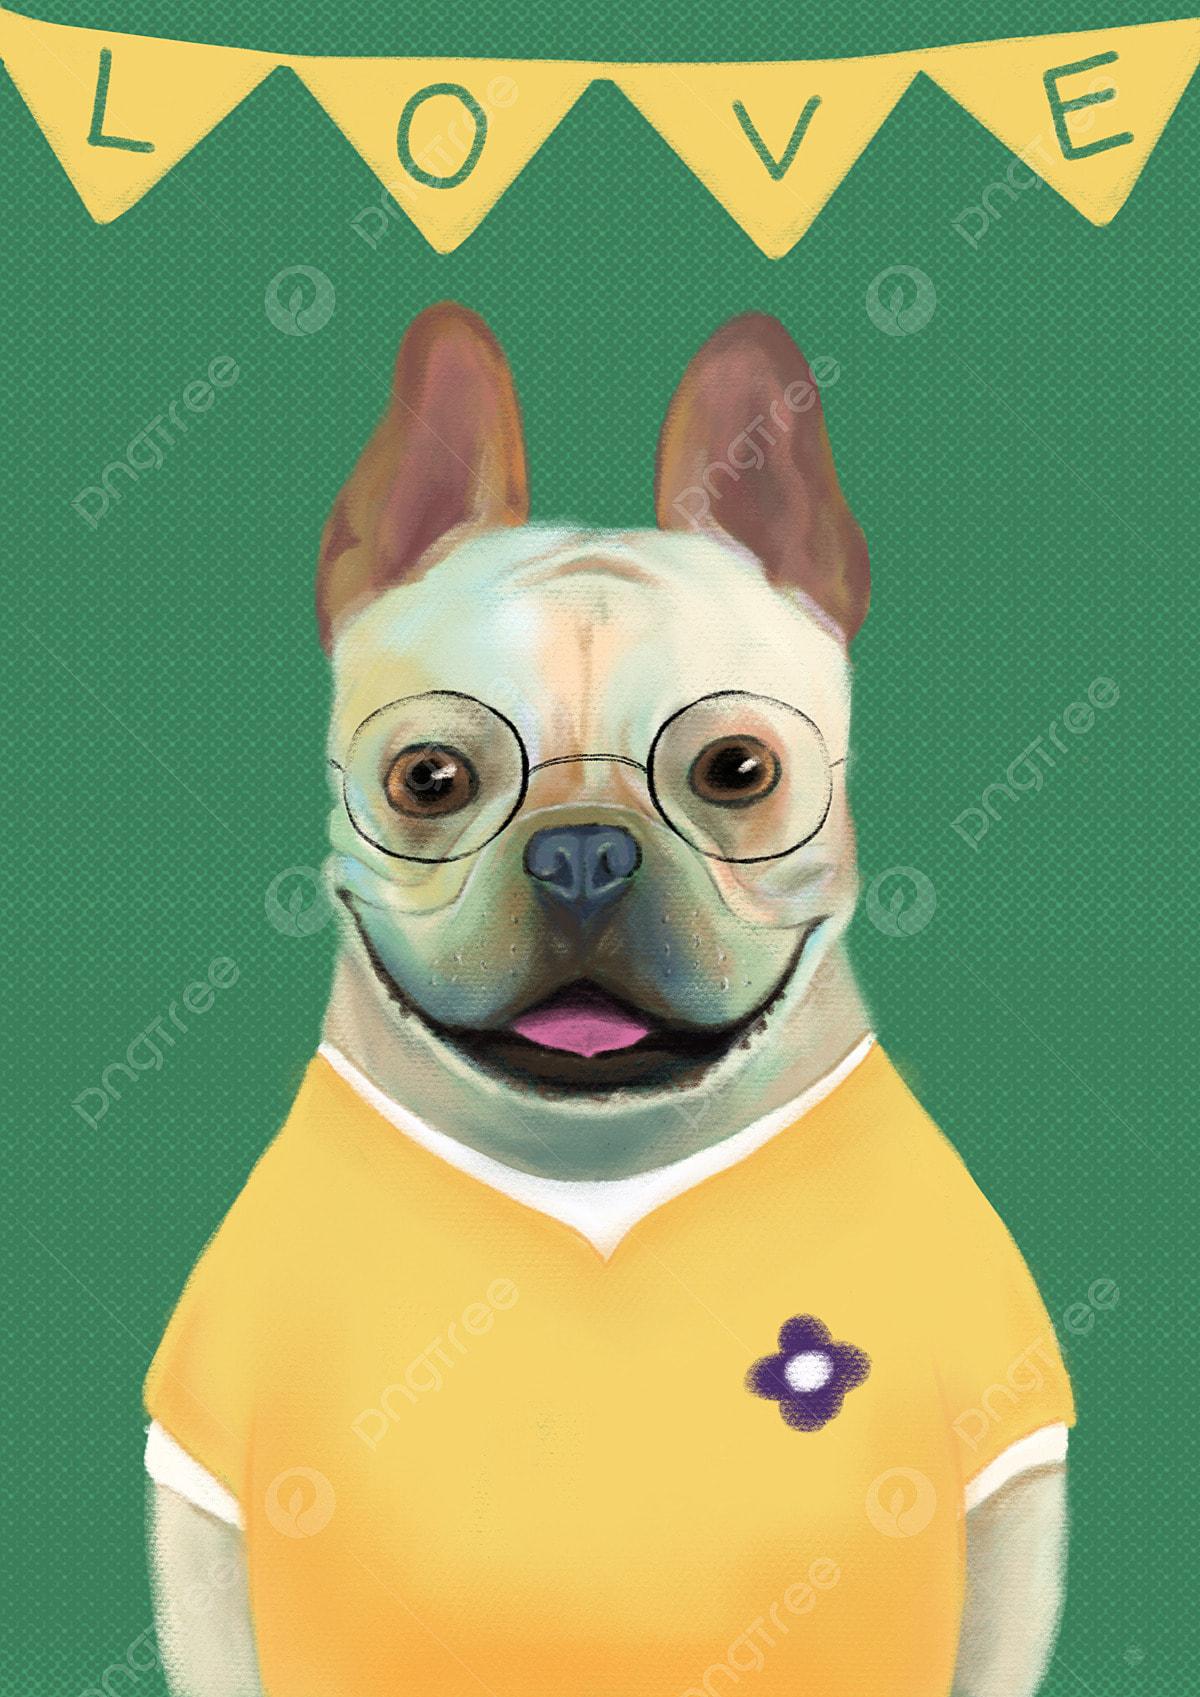 Drunk Bulldog Clip Art - Royalty Free - GoGraph